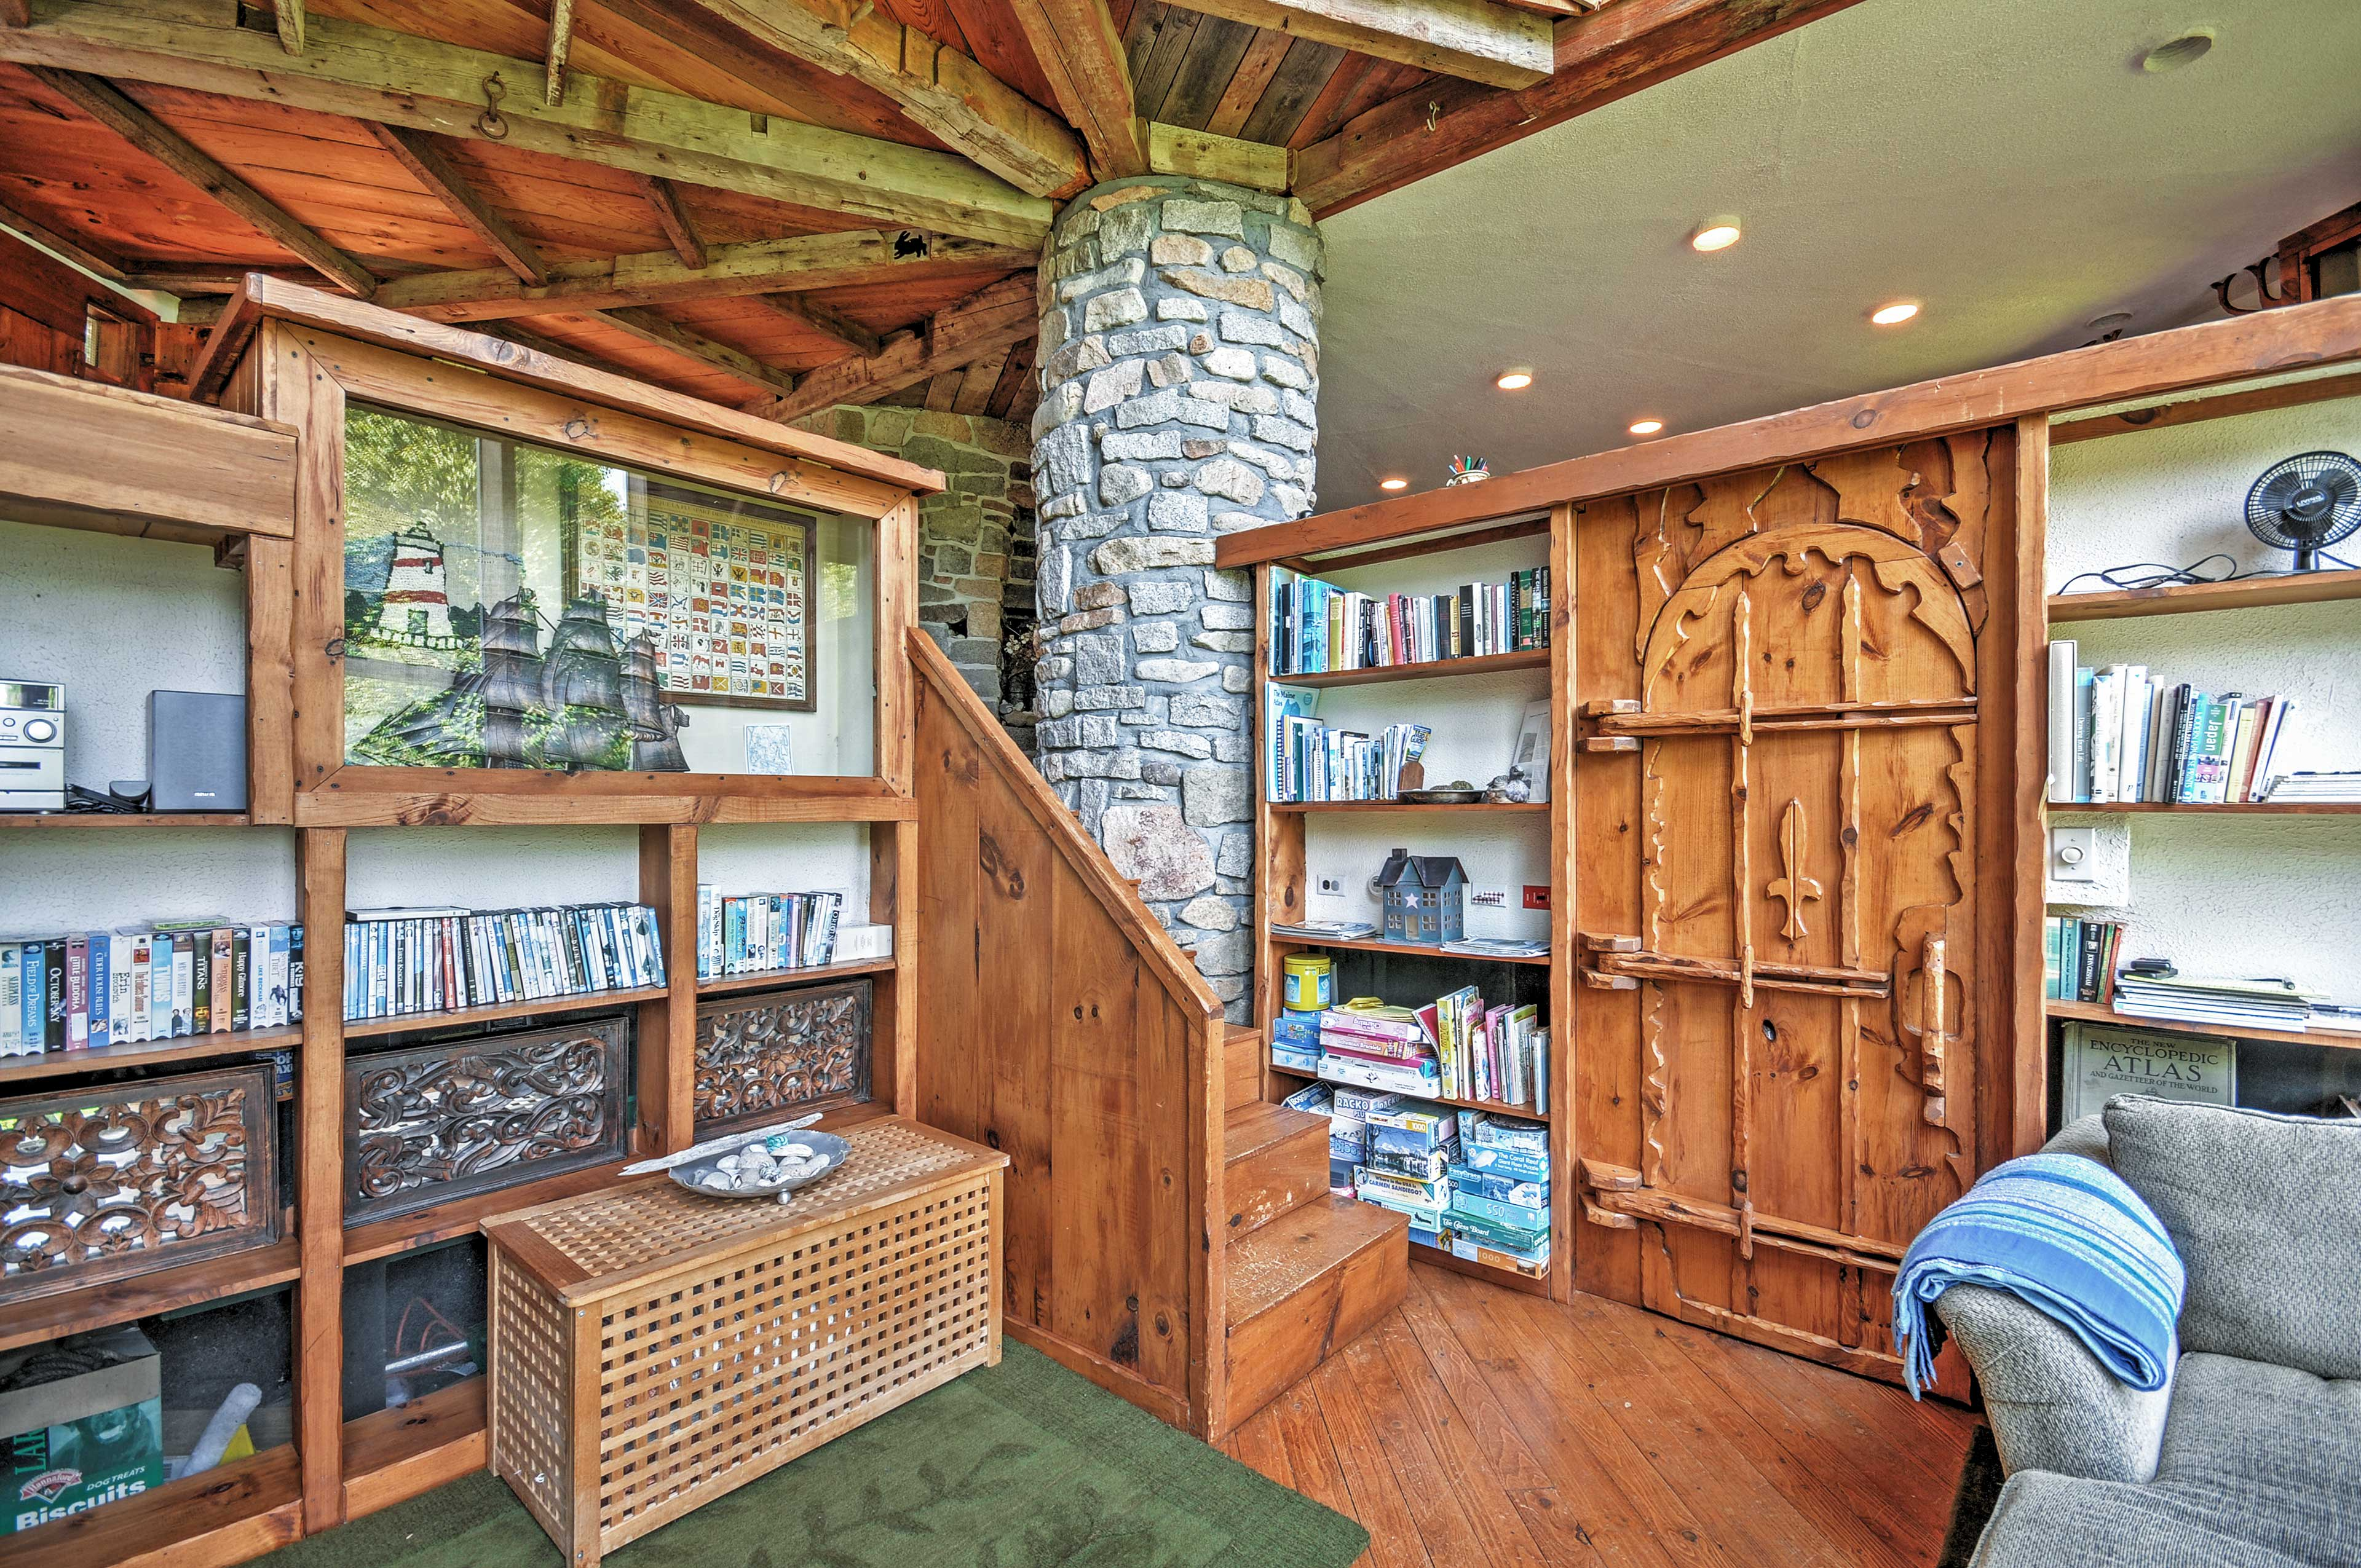 Den | Authentic Stone & Wooden Accents